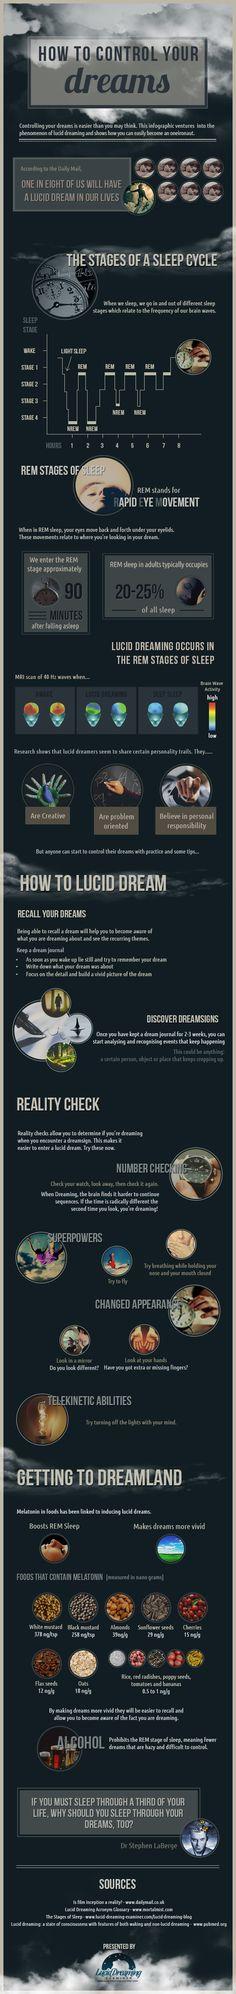 lucid dreaming infographic 2013 be awake while you sleep